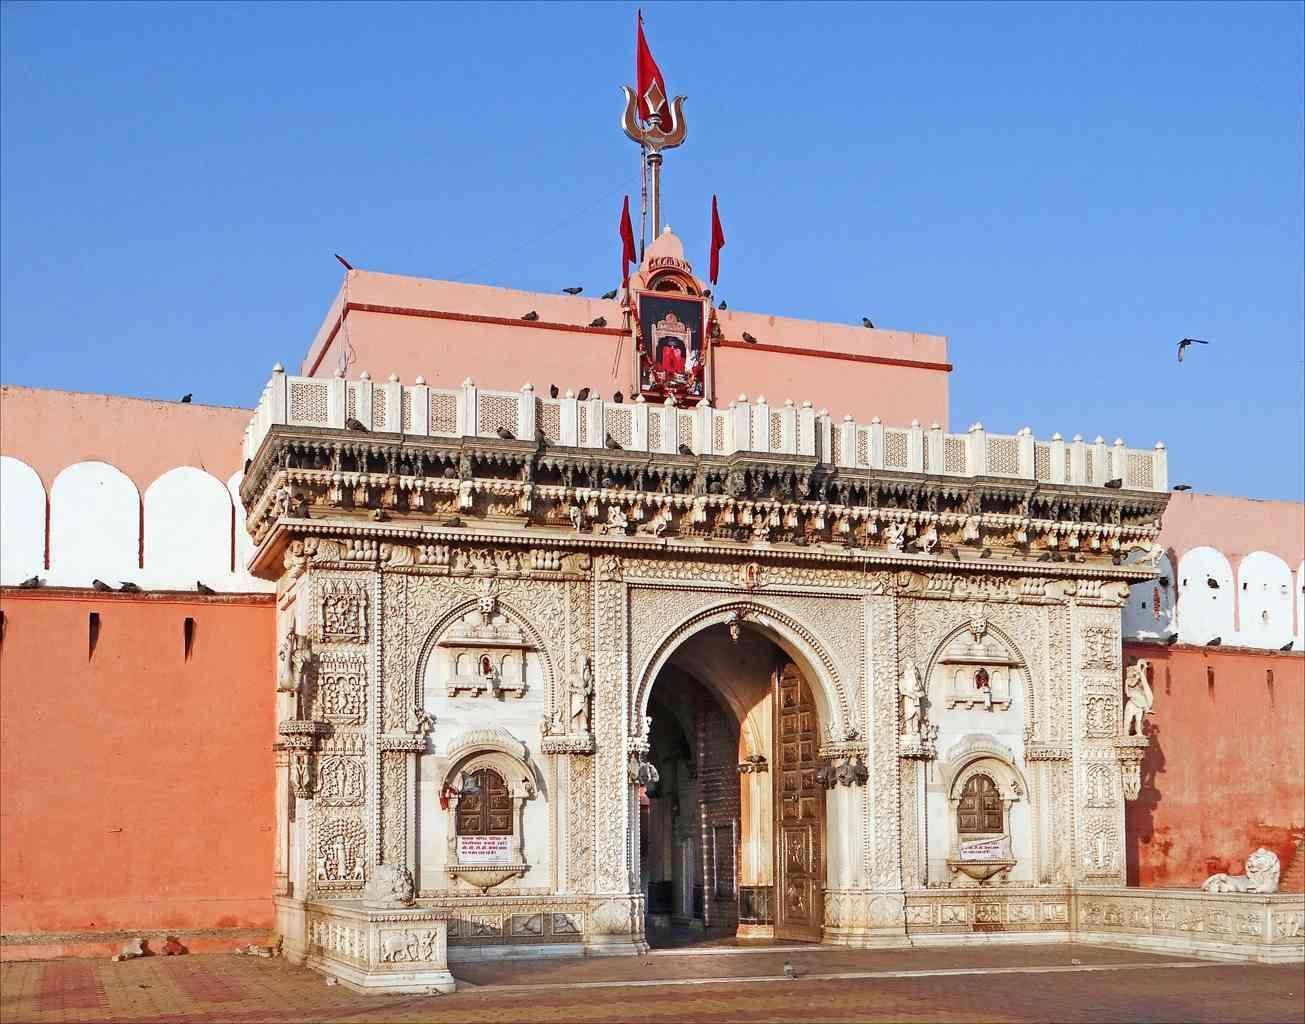 Karni Mata Temple, Deshnoke, Bikaner, Rajasthan